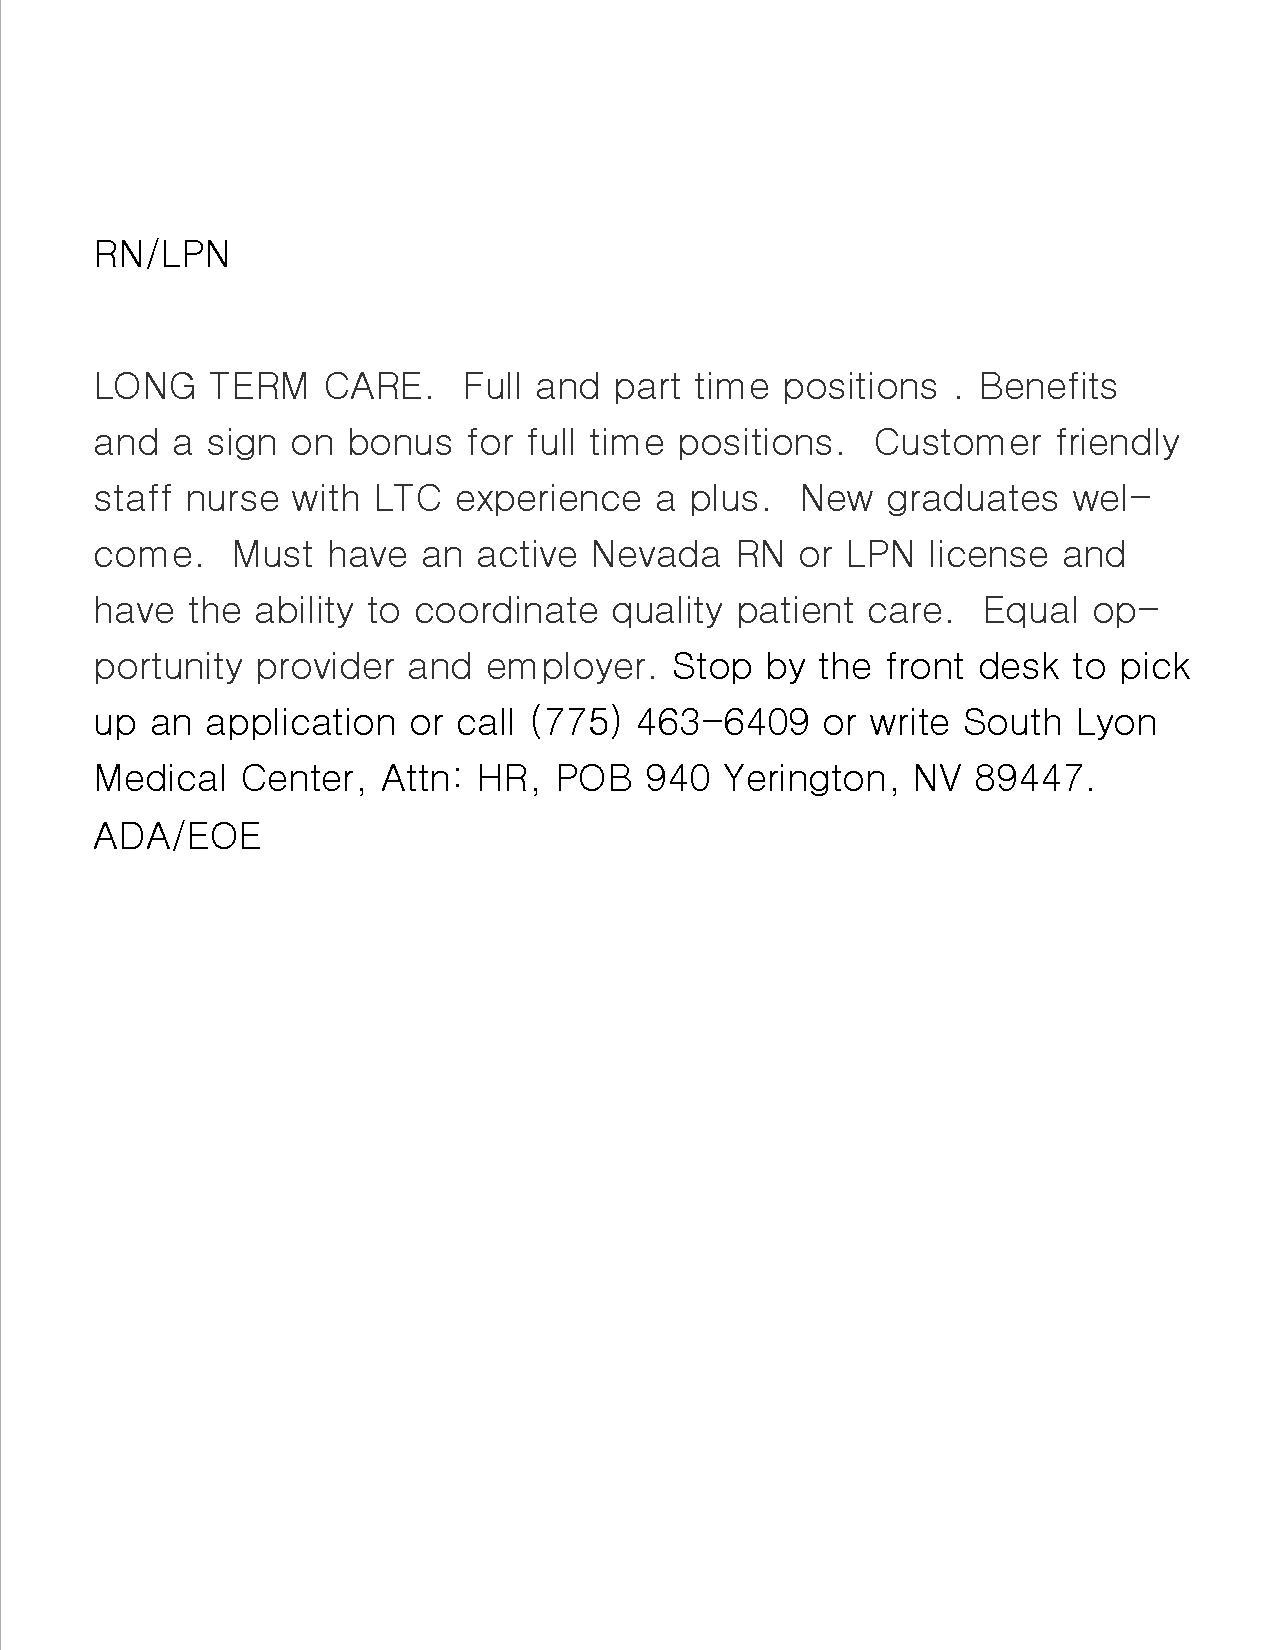 Rn Lpn Long Term Care South Lyon Medical Center